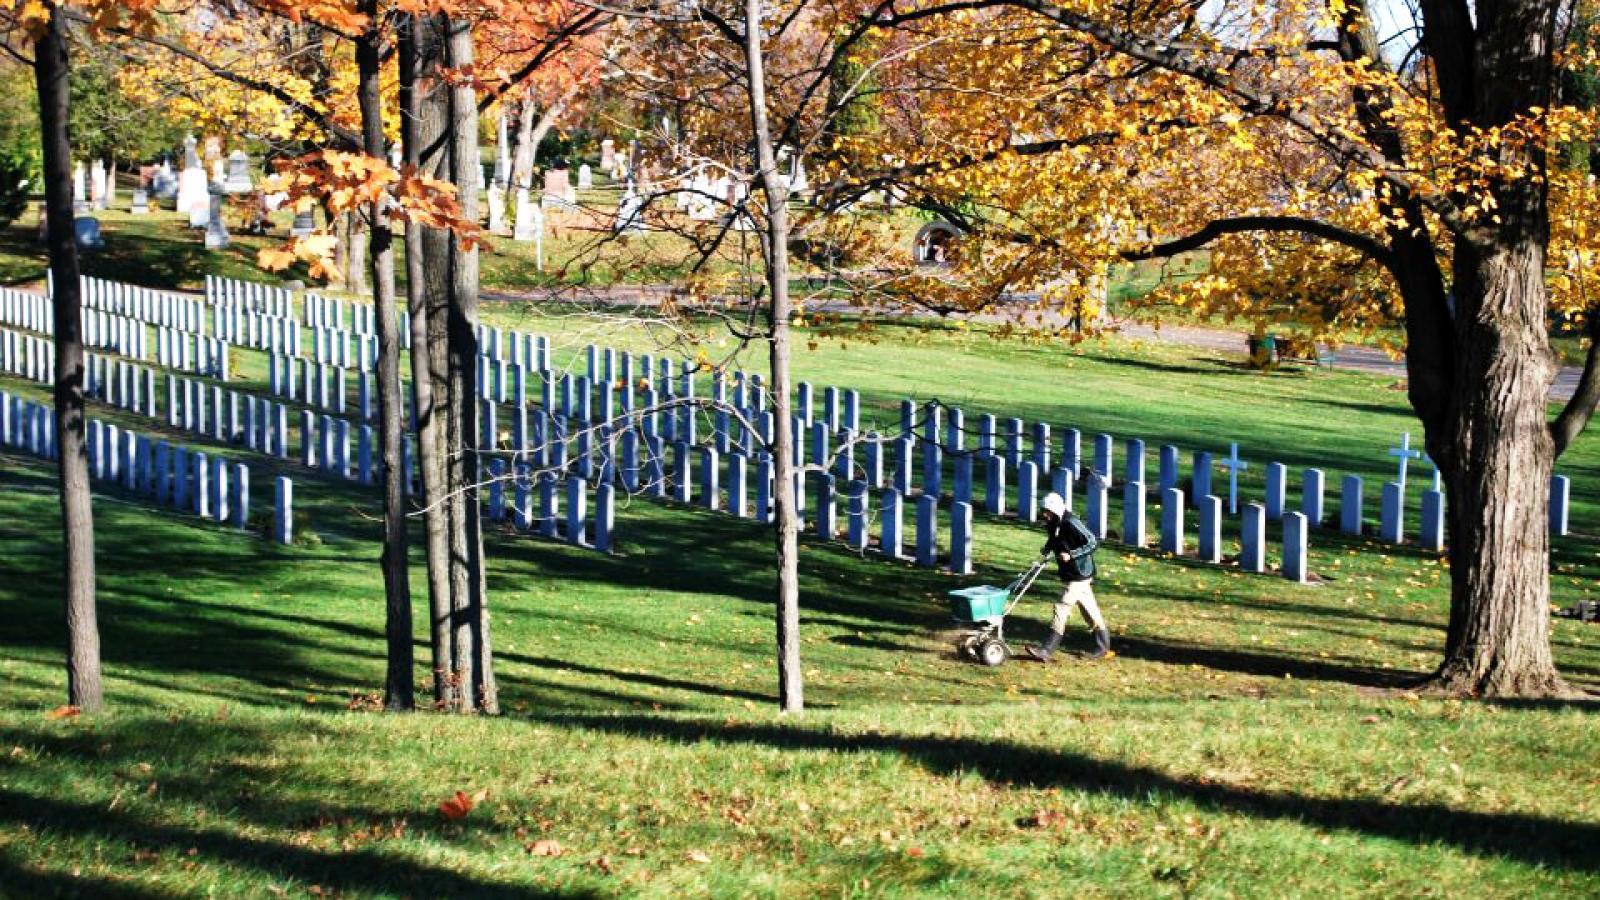 LO volunteers keep the military cemetery beautiful.